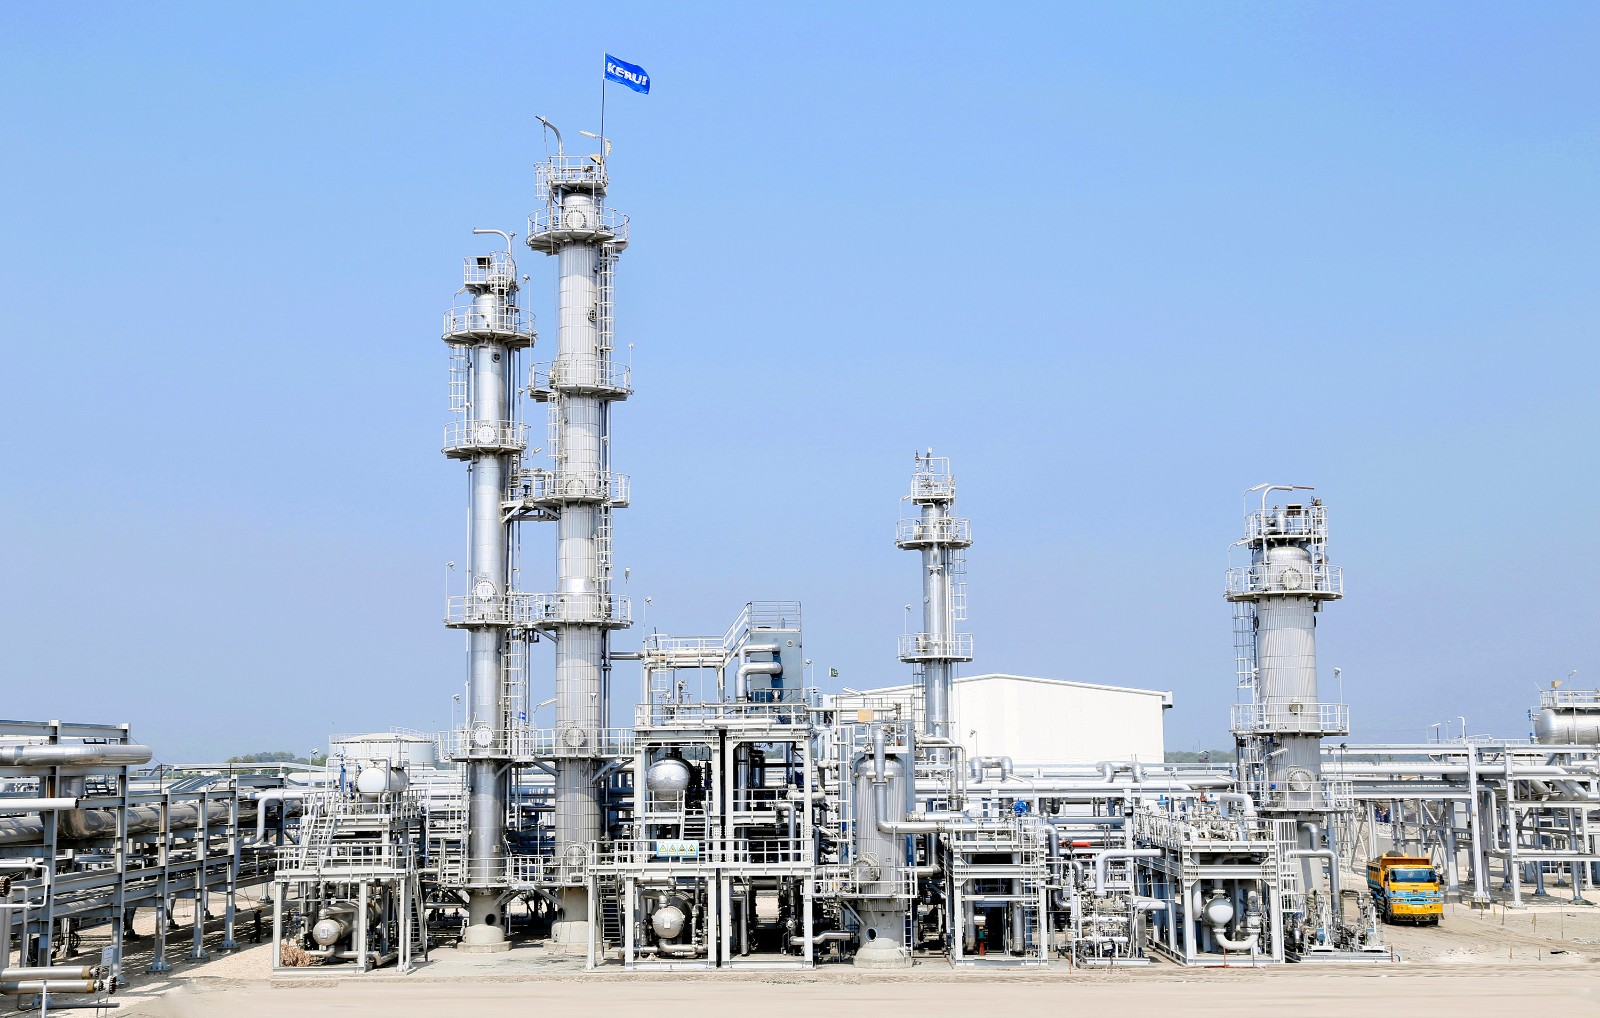 Natural gas processing & utilization